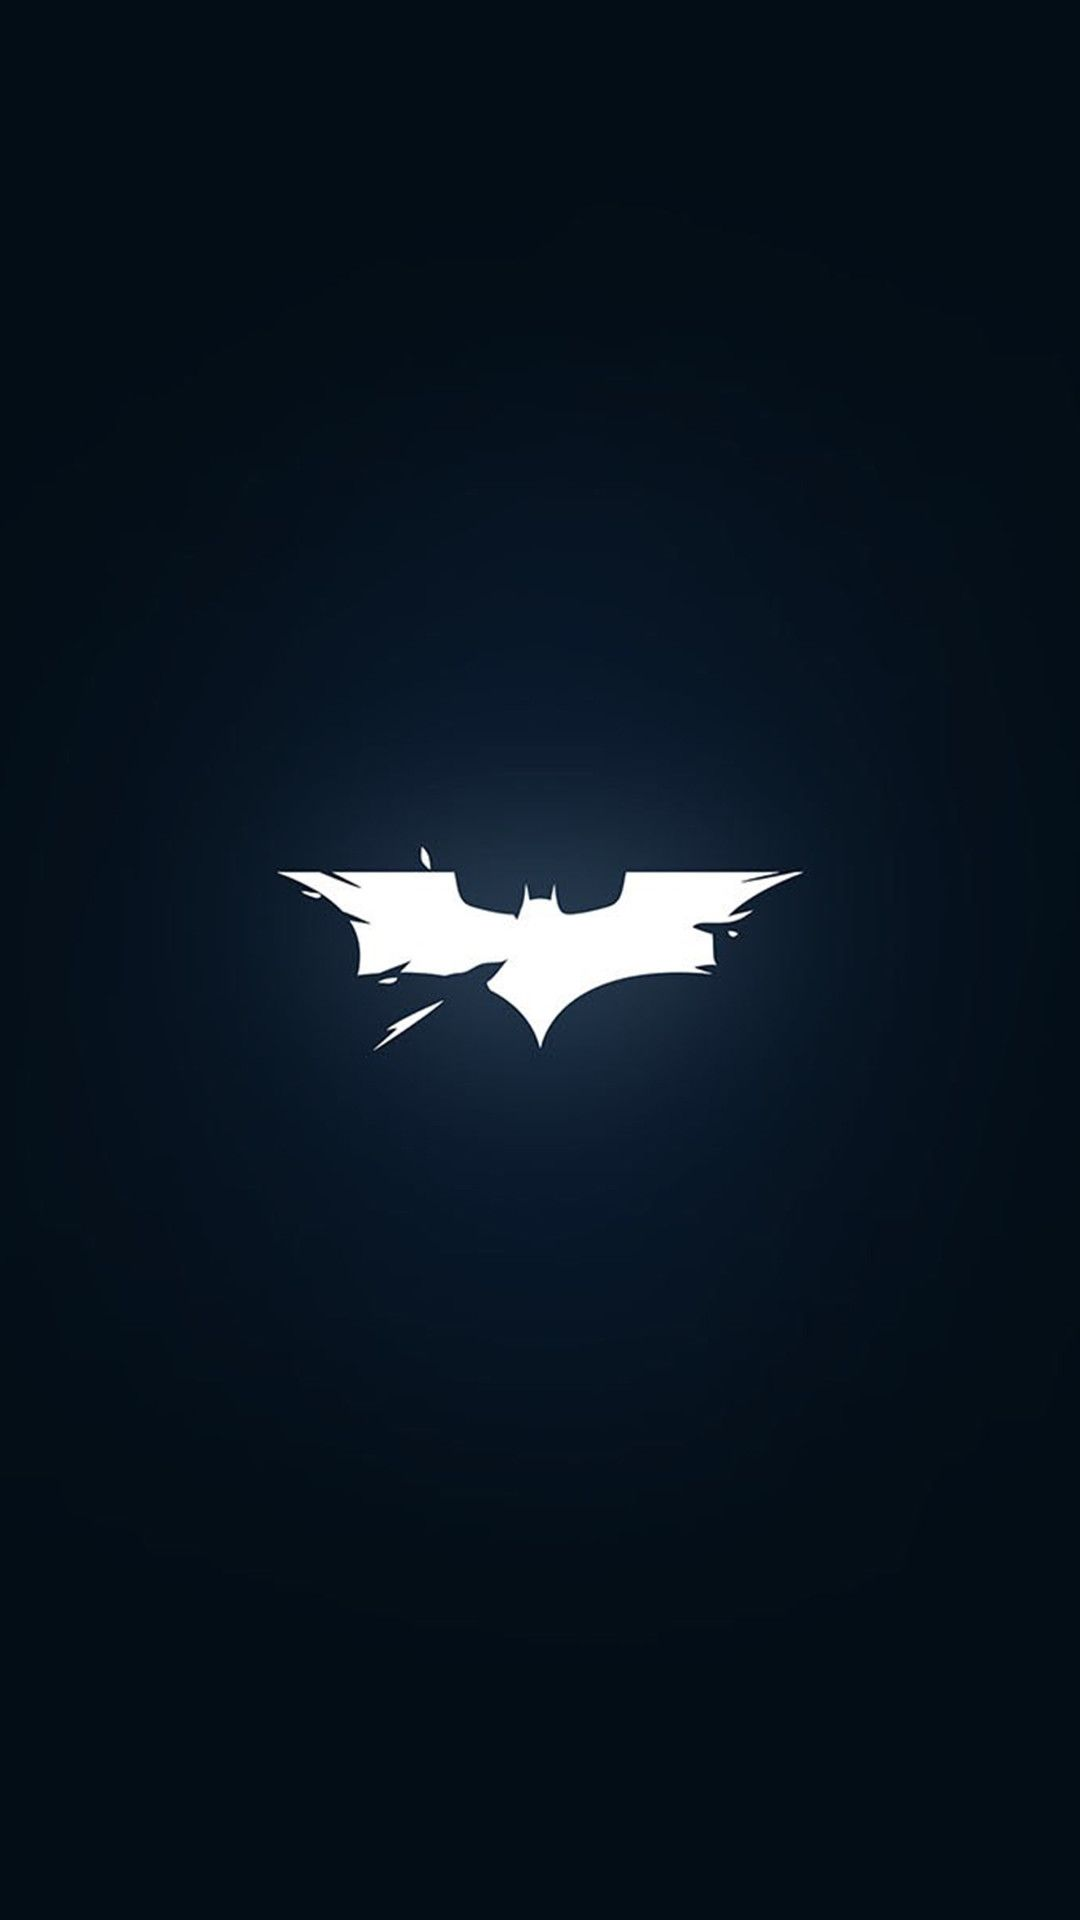 1080x1920 Batman Wallpaper Batman Wallpaper Batman Logo Batman Logo Wallpapers